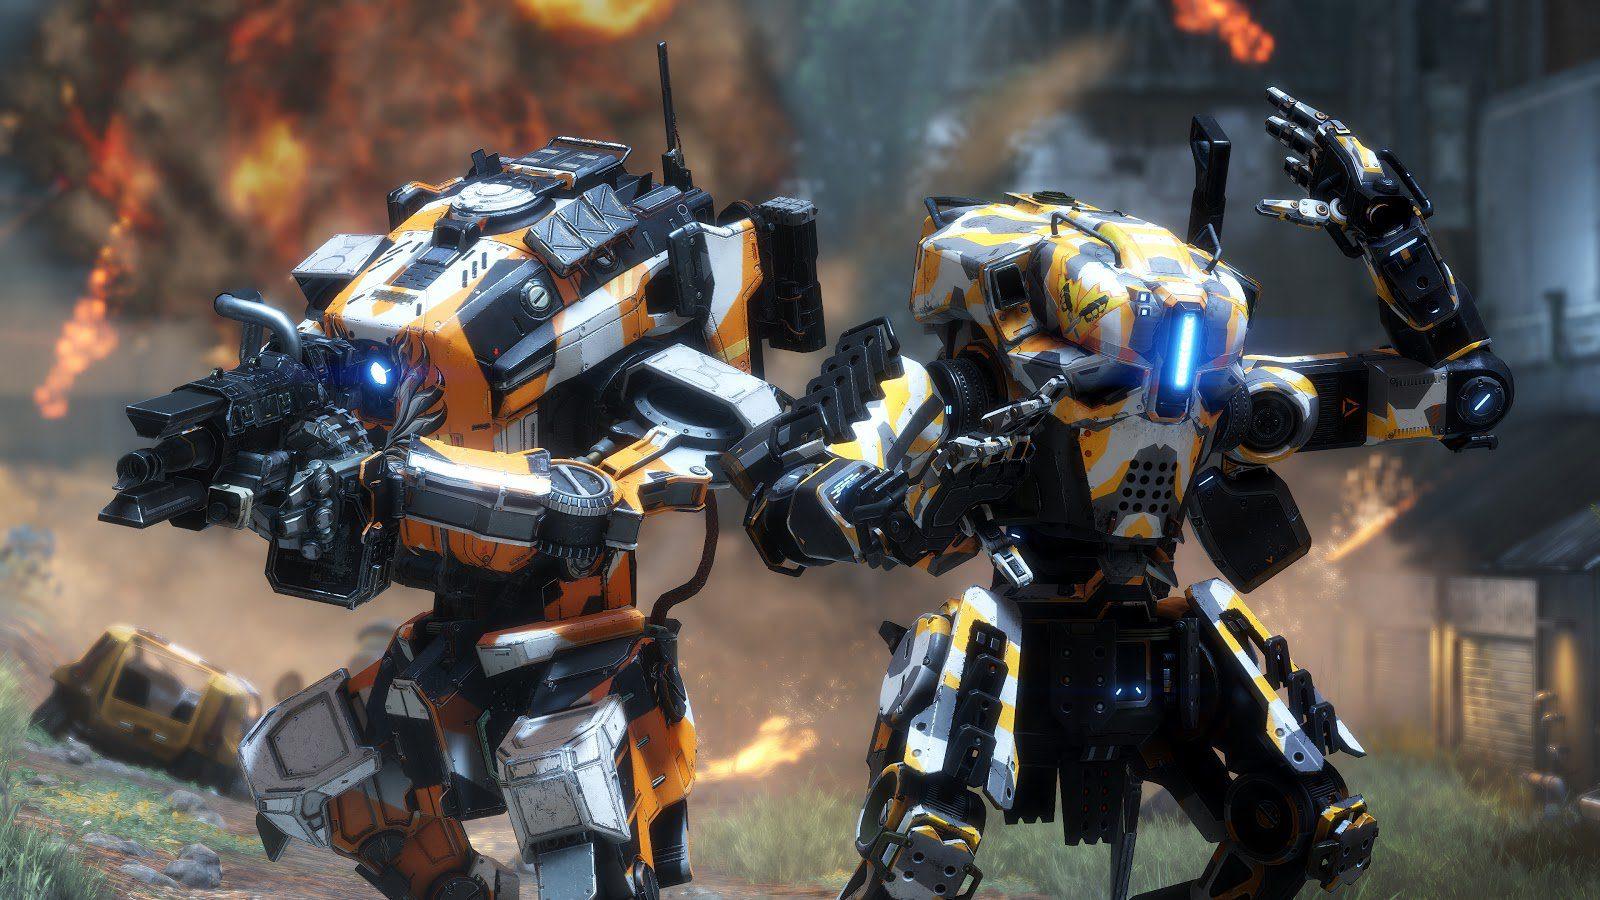 Monarch Prime Titanfall 2 Xbox One X